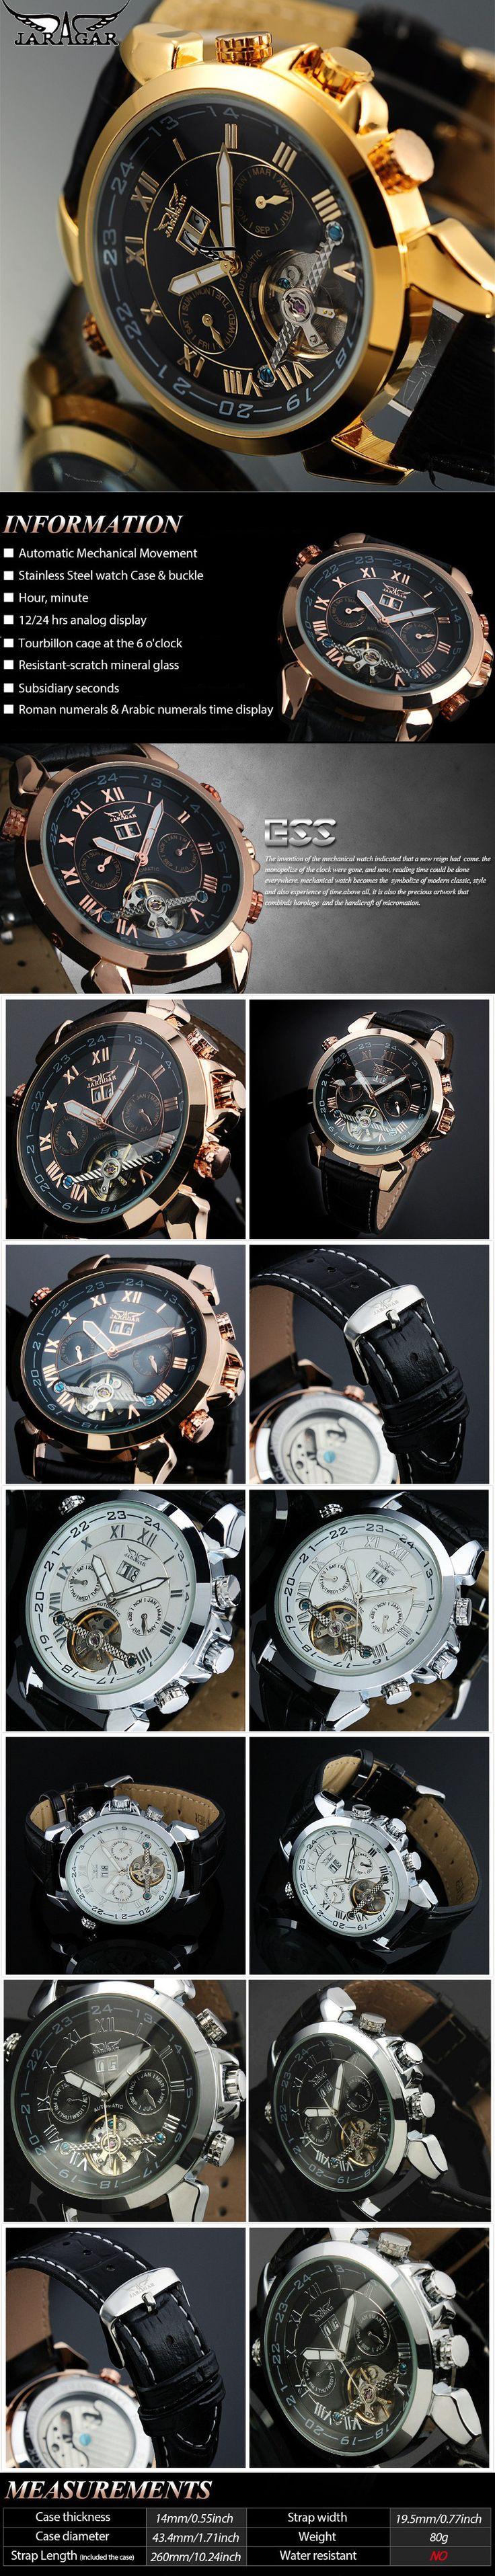 JARAGAR F120504 Fashion Automatic Mechanical Watch Date Display Leather Strap Men Wrist Watch